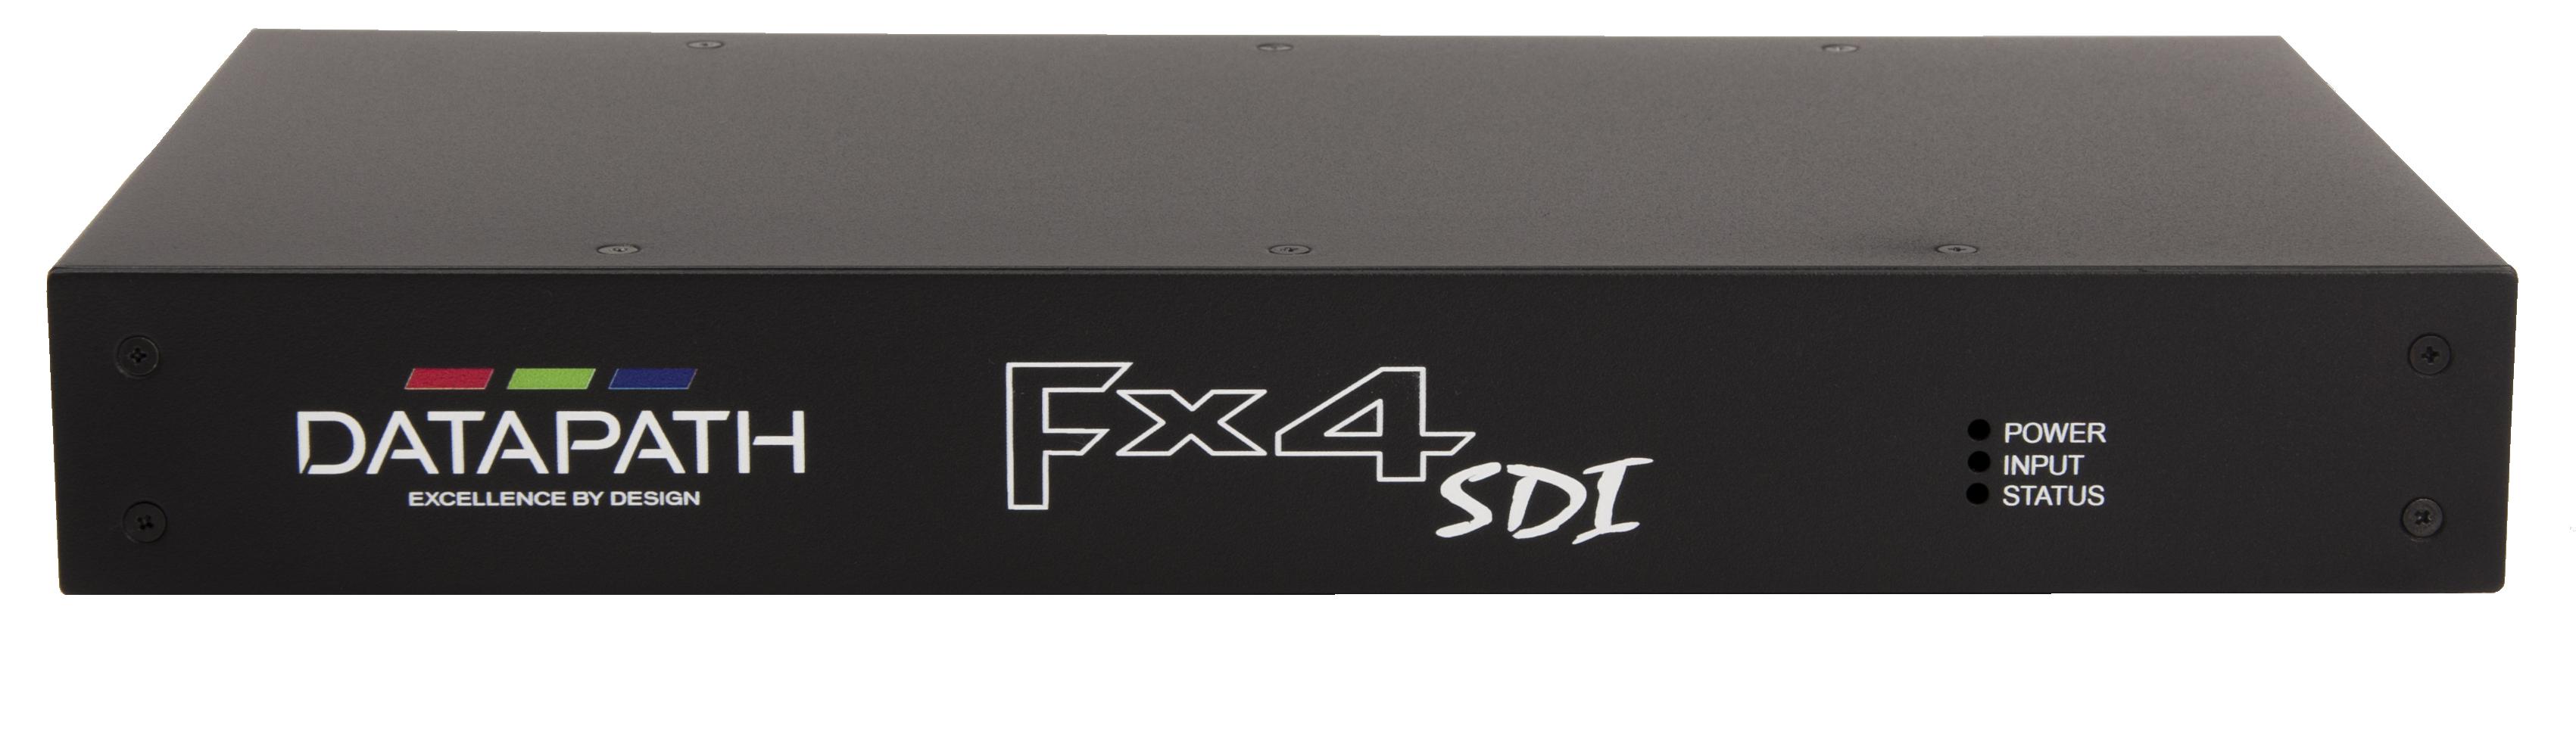 Datapath-Fx4-SDI-front1